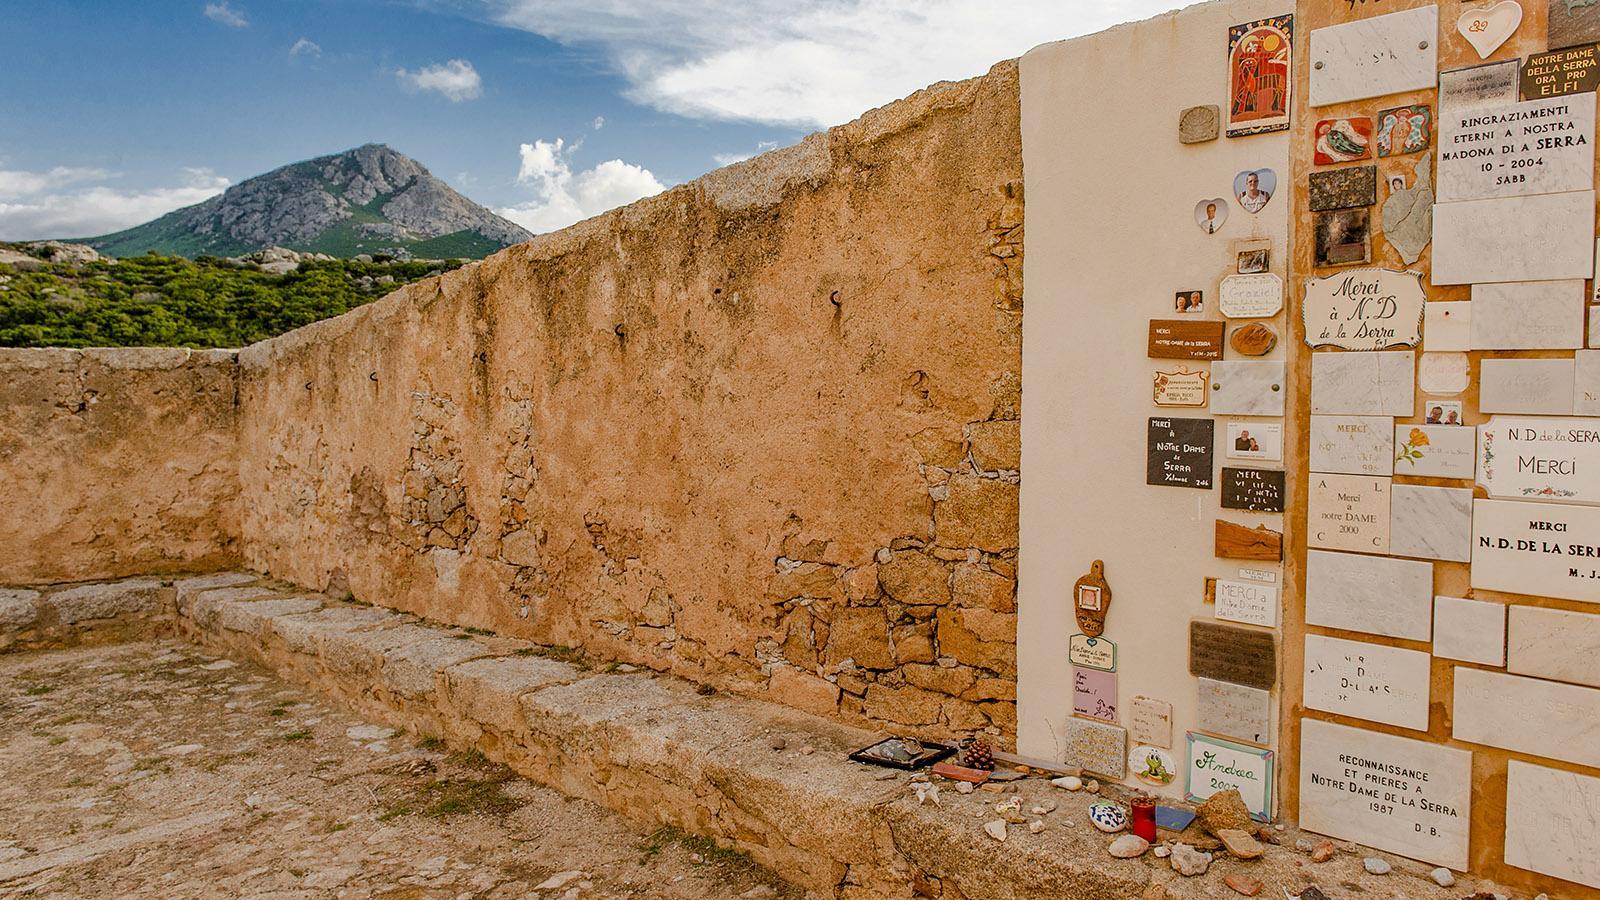 Calvi: Notre-Dame de la Serra, Votivtafeln. Foto: Hilke Maunder